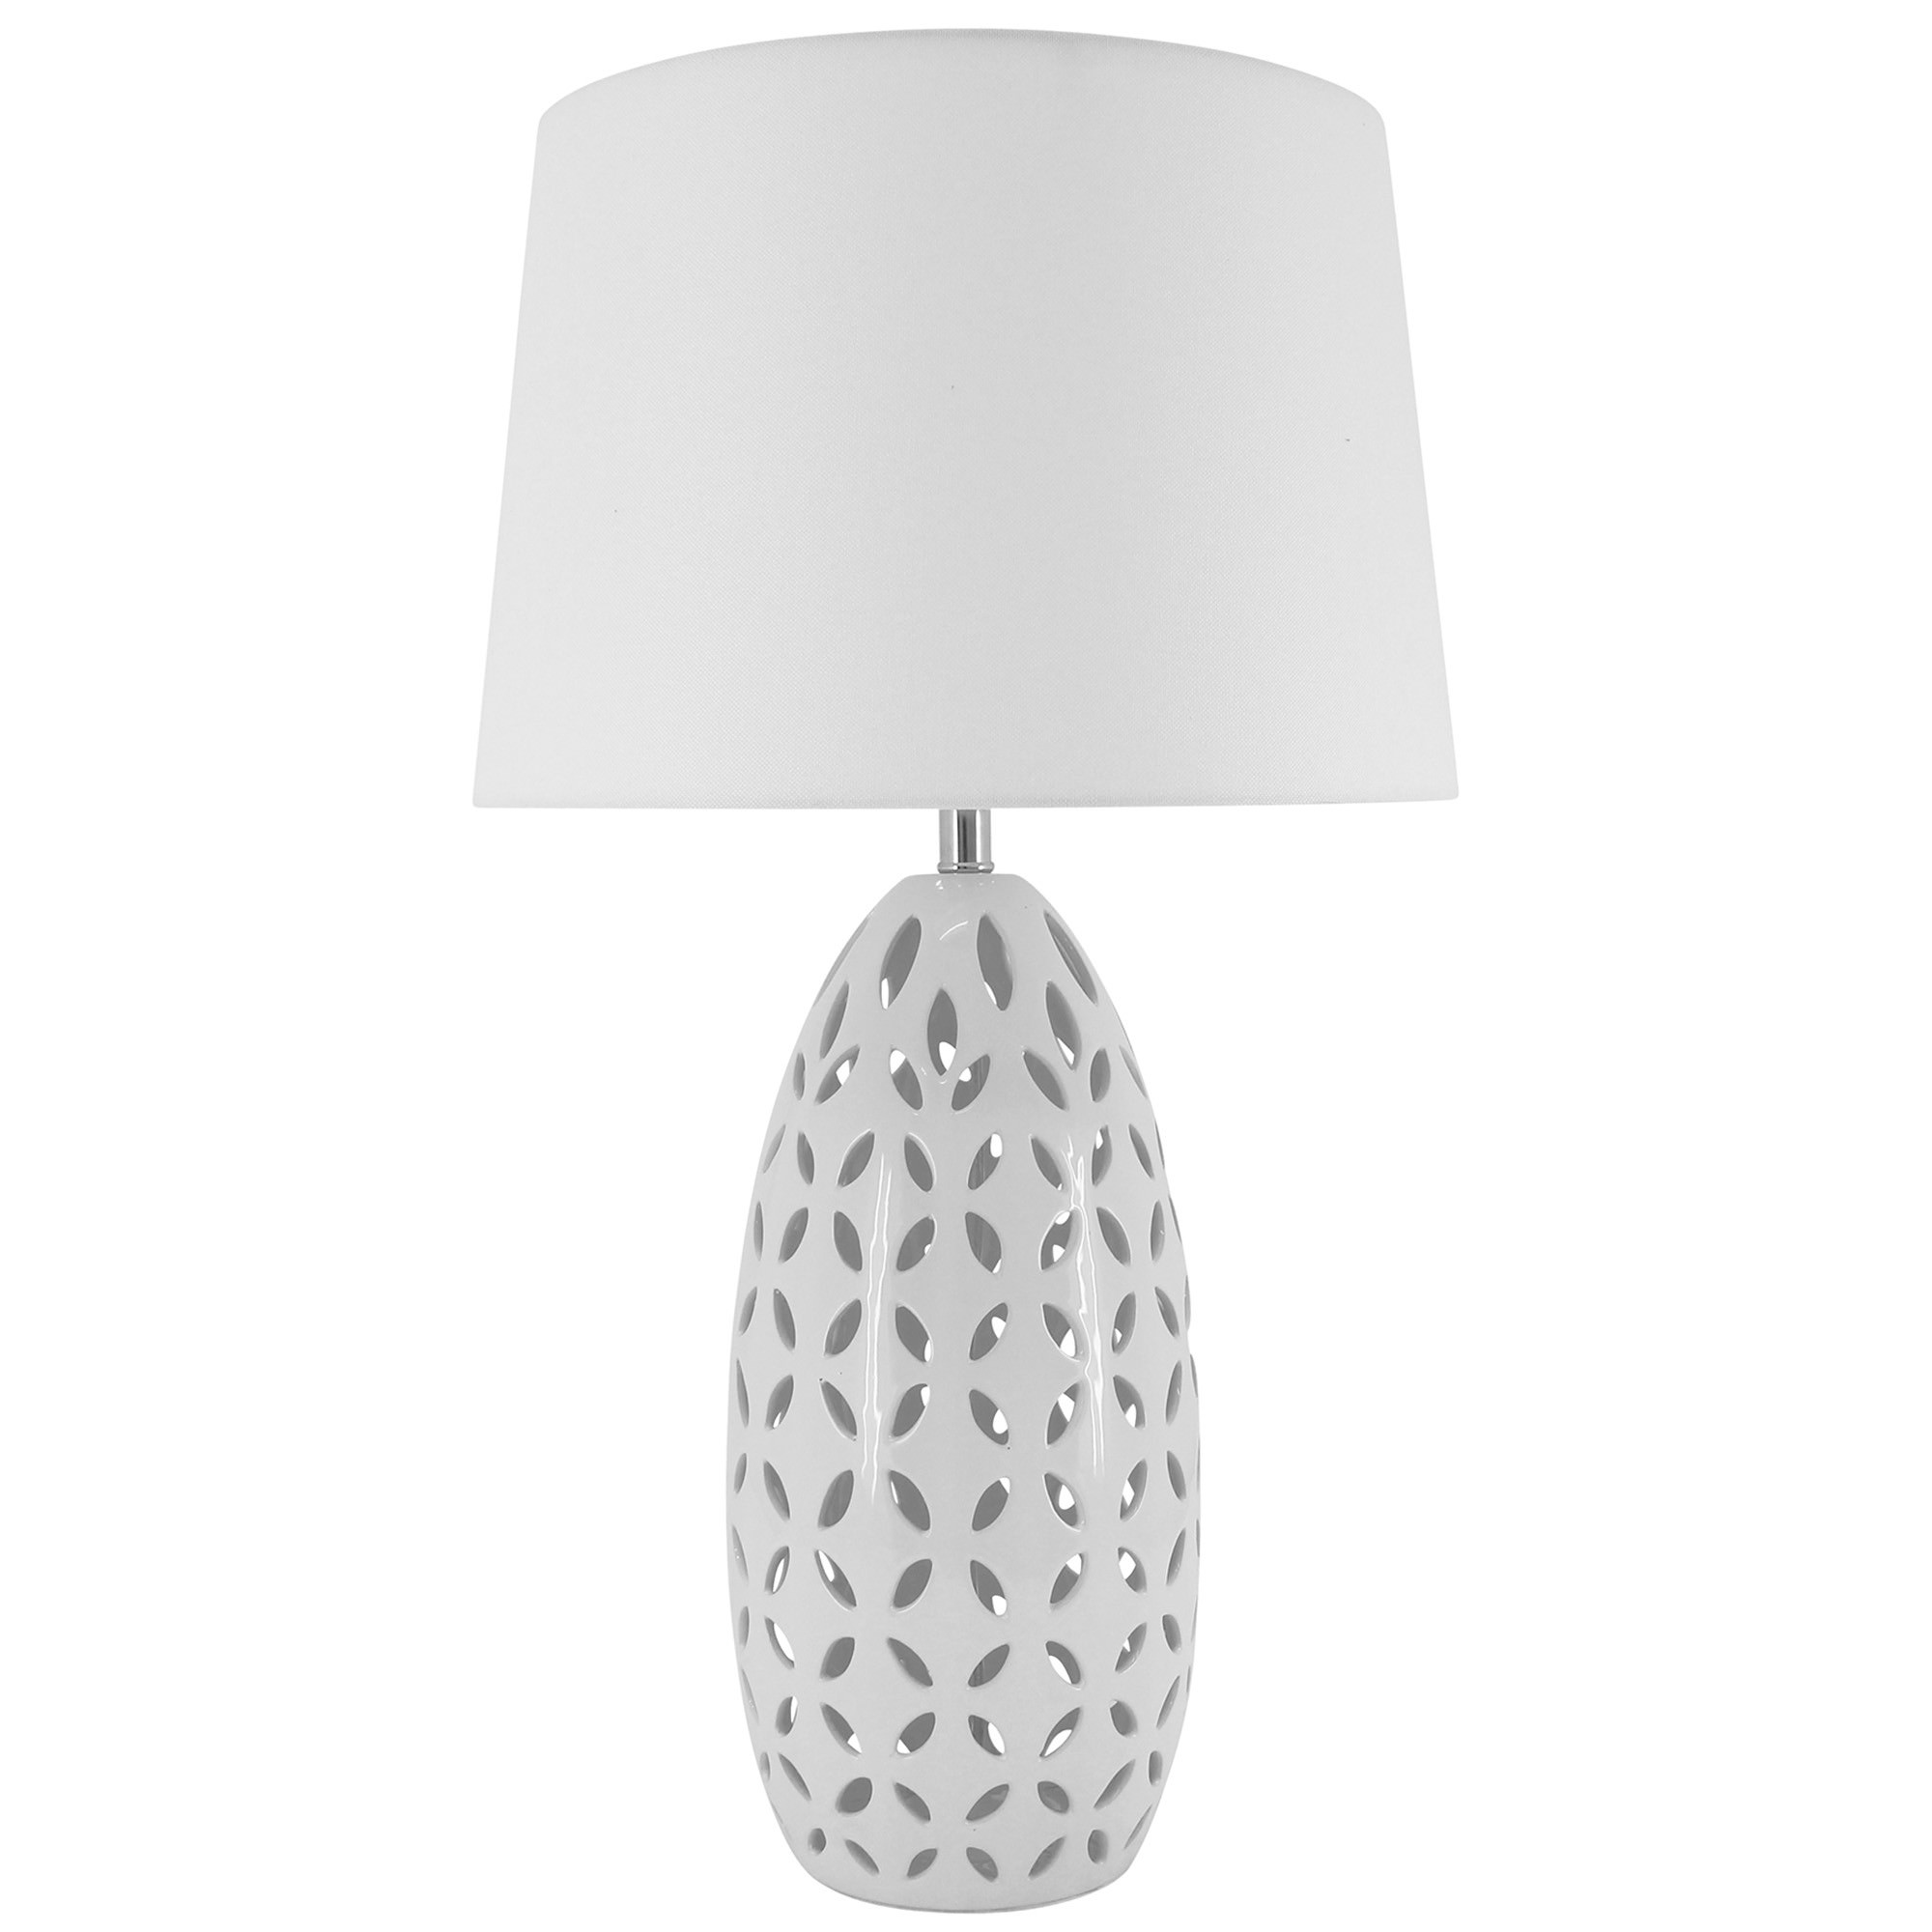 Kiran Ceramic Base Table Lamp, White